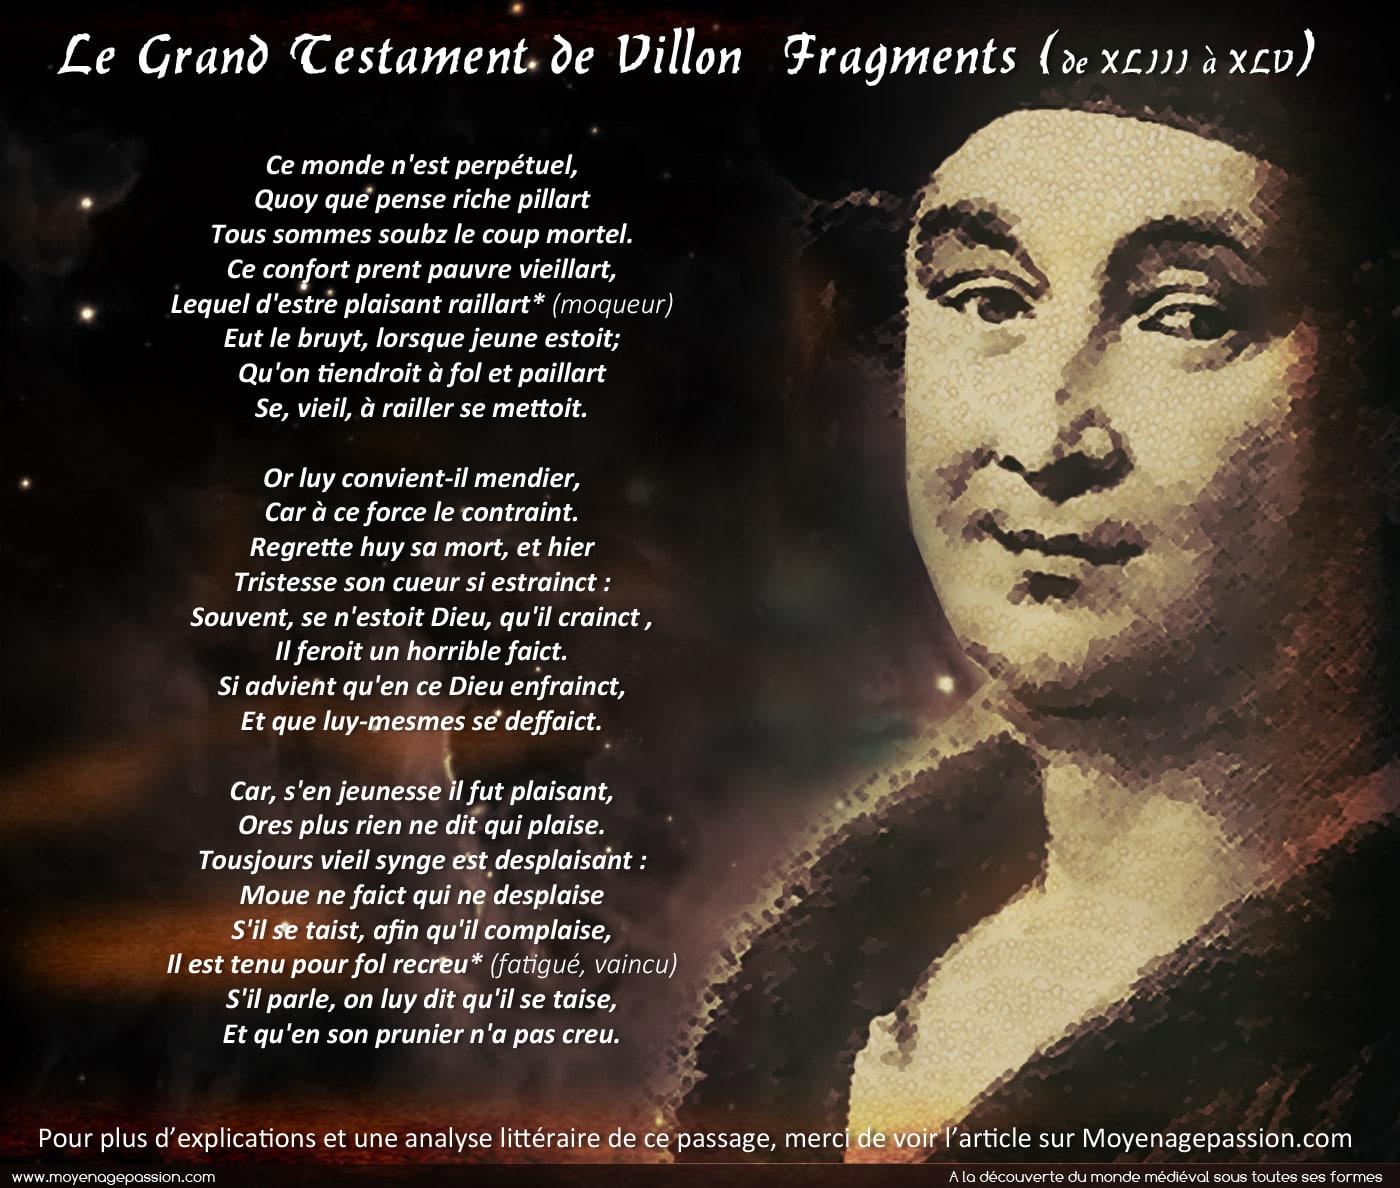 francois_villon_grand_testament_fragments_poesie_medievale_moyen-age_tardif